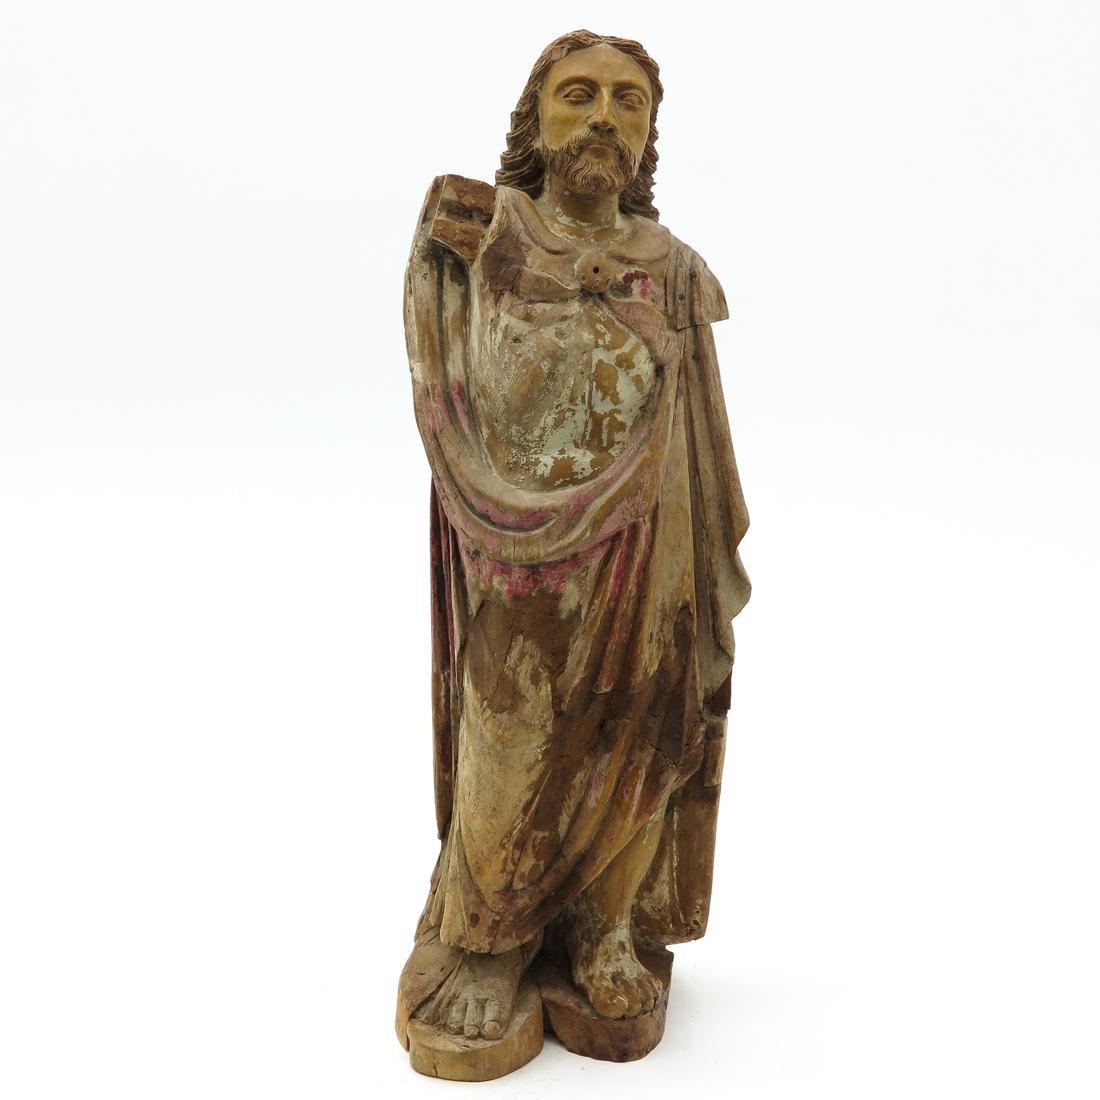 Carved Wood Sculpture Depicting Christ Circa 1780